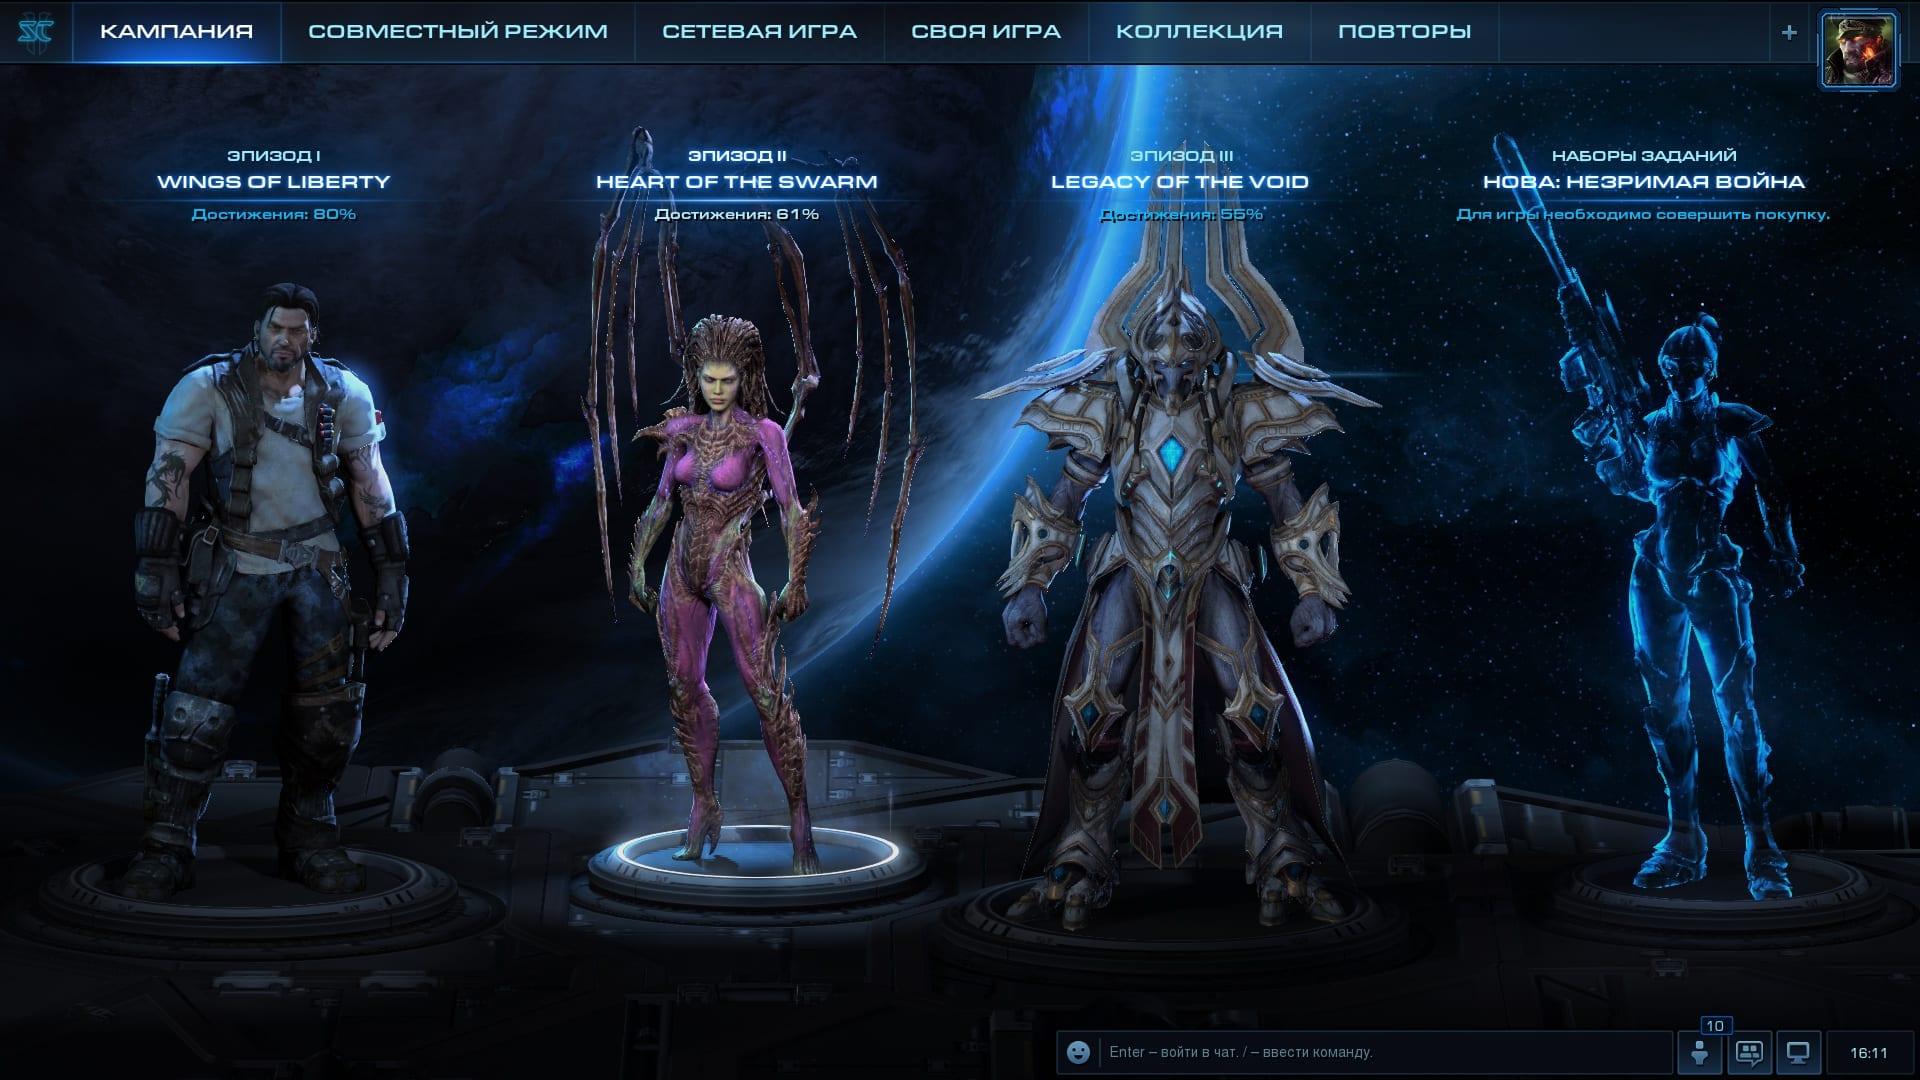 StarCraft 2 compains